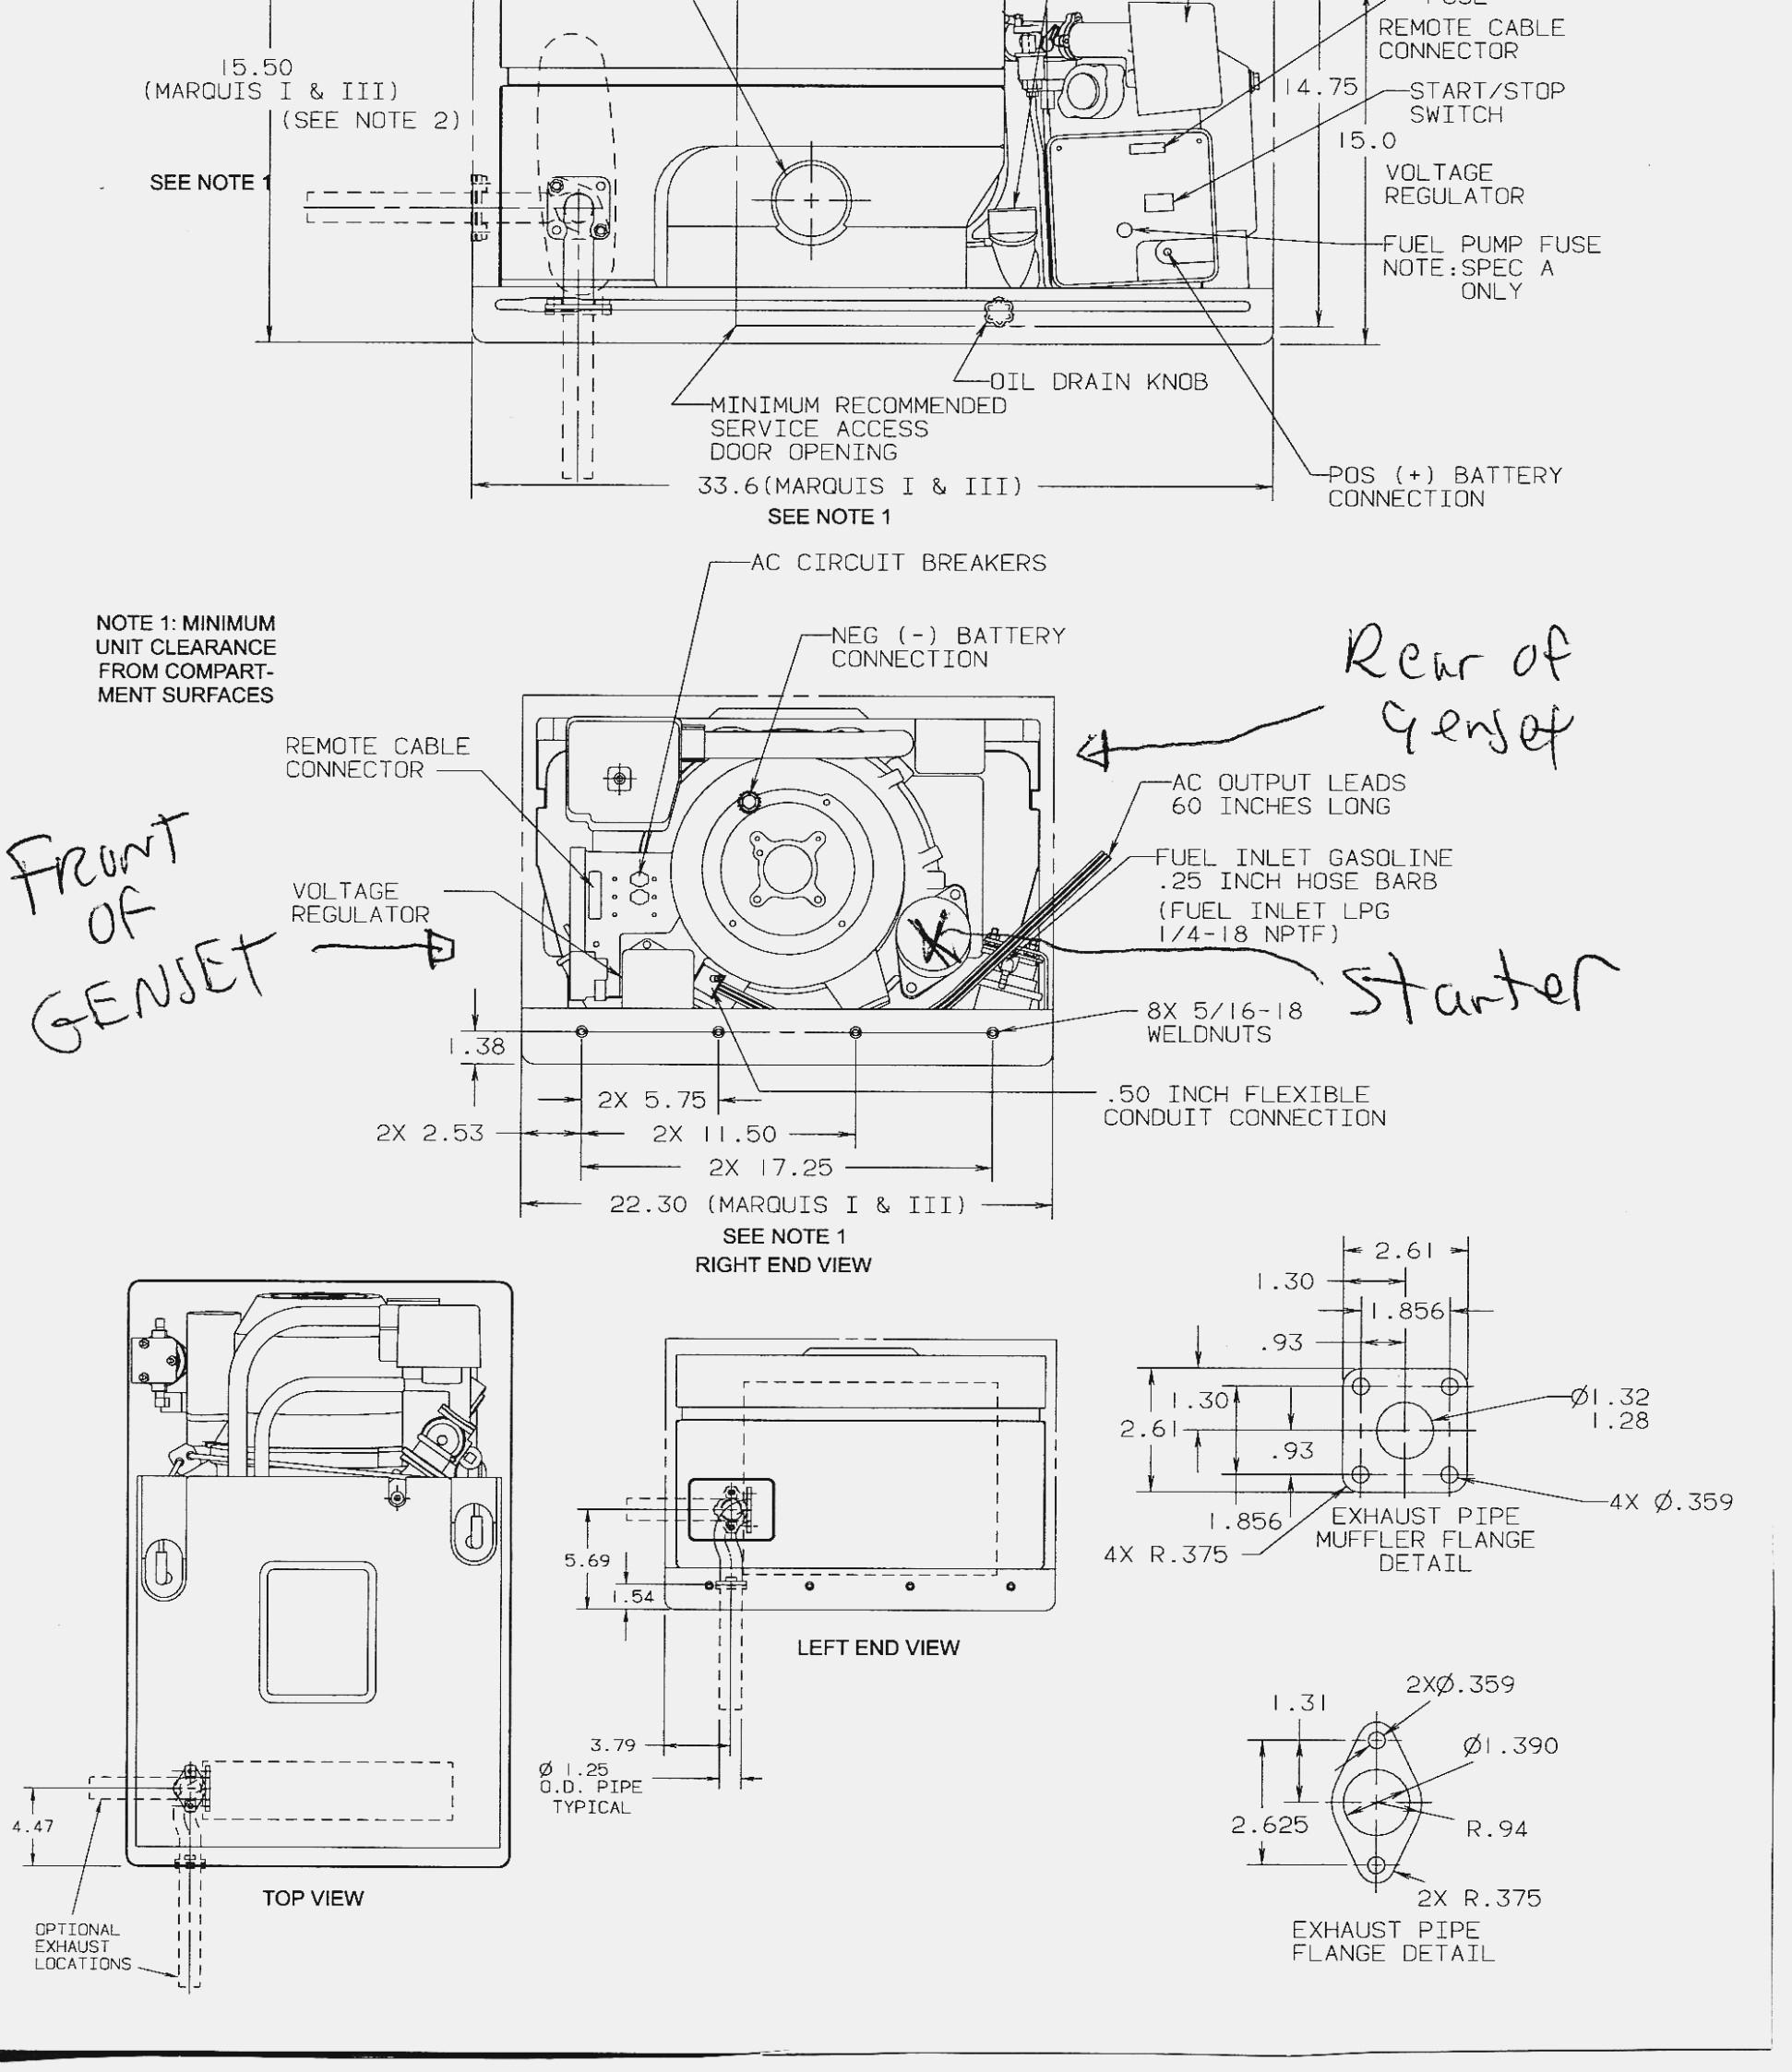 Onan Emerald 1 Wiring Diagram | Wiring Diagram - Onan Emerald 1 Genset Wiring Diagram